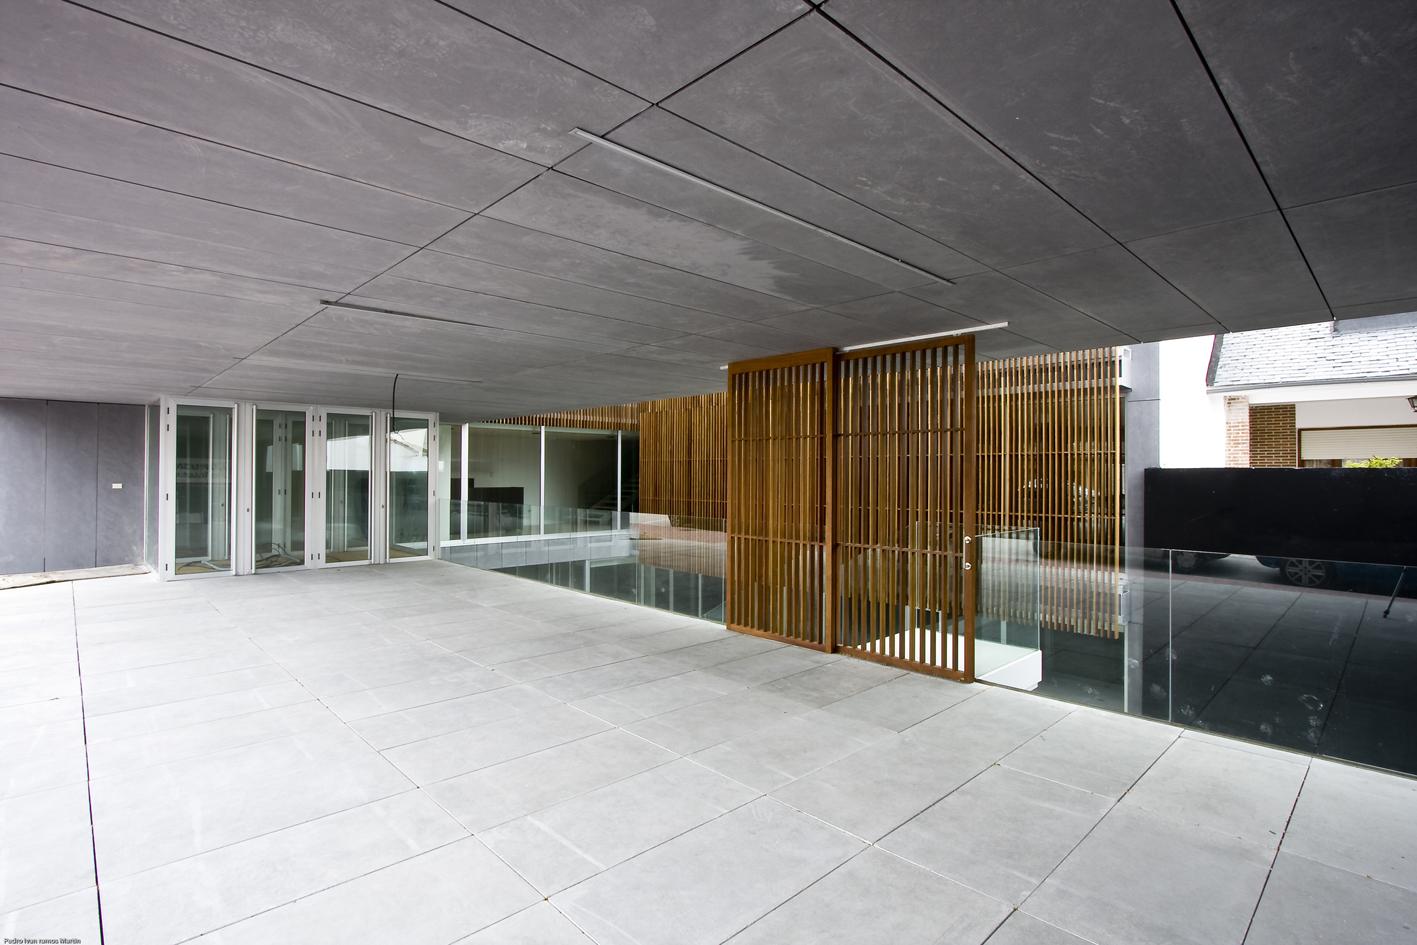 Centro Cívico Municipal de Boecillo / José Manuel M. Rodríguez, Inés E. Conesa, Fernando N. Fernández, © Pedro Iván Ramos Martín